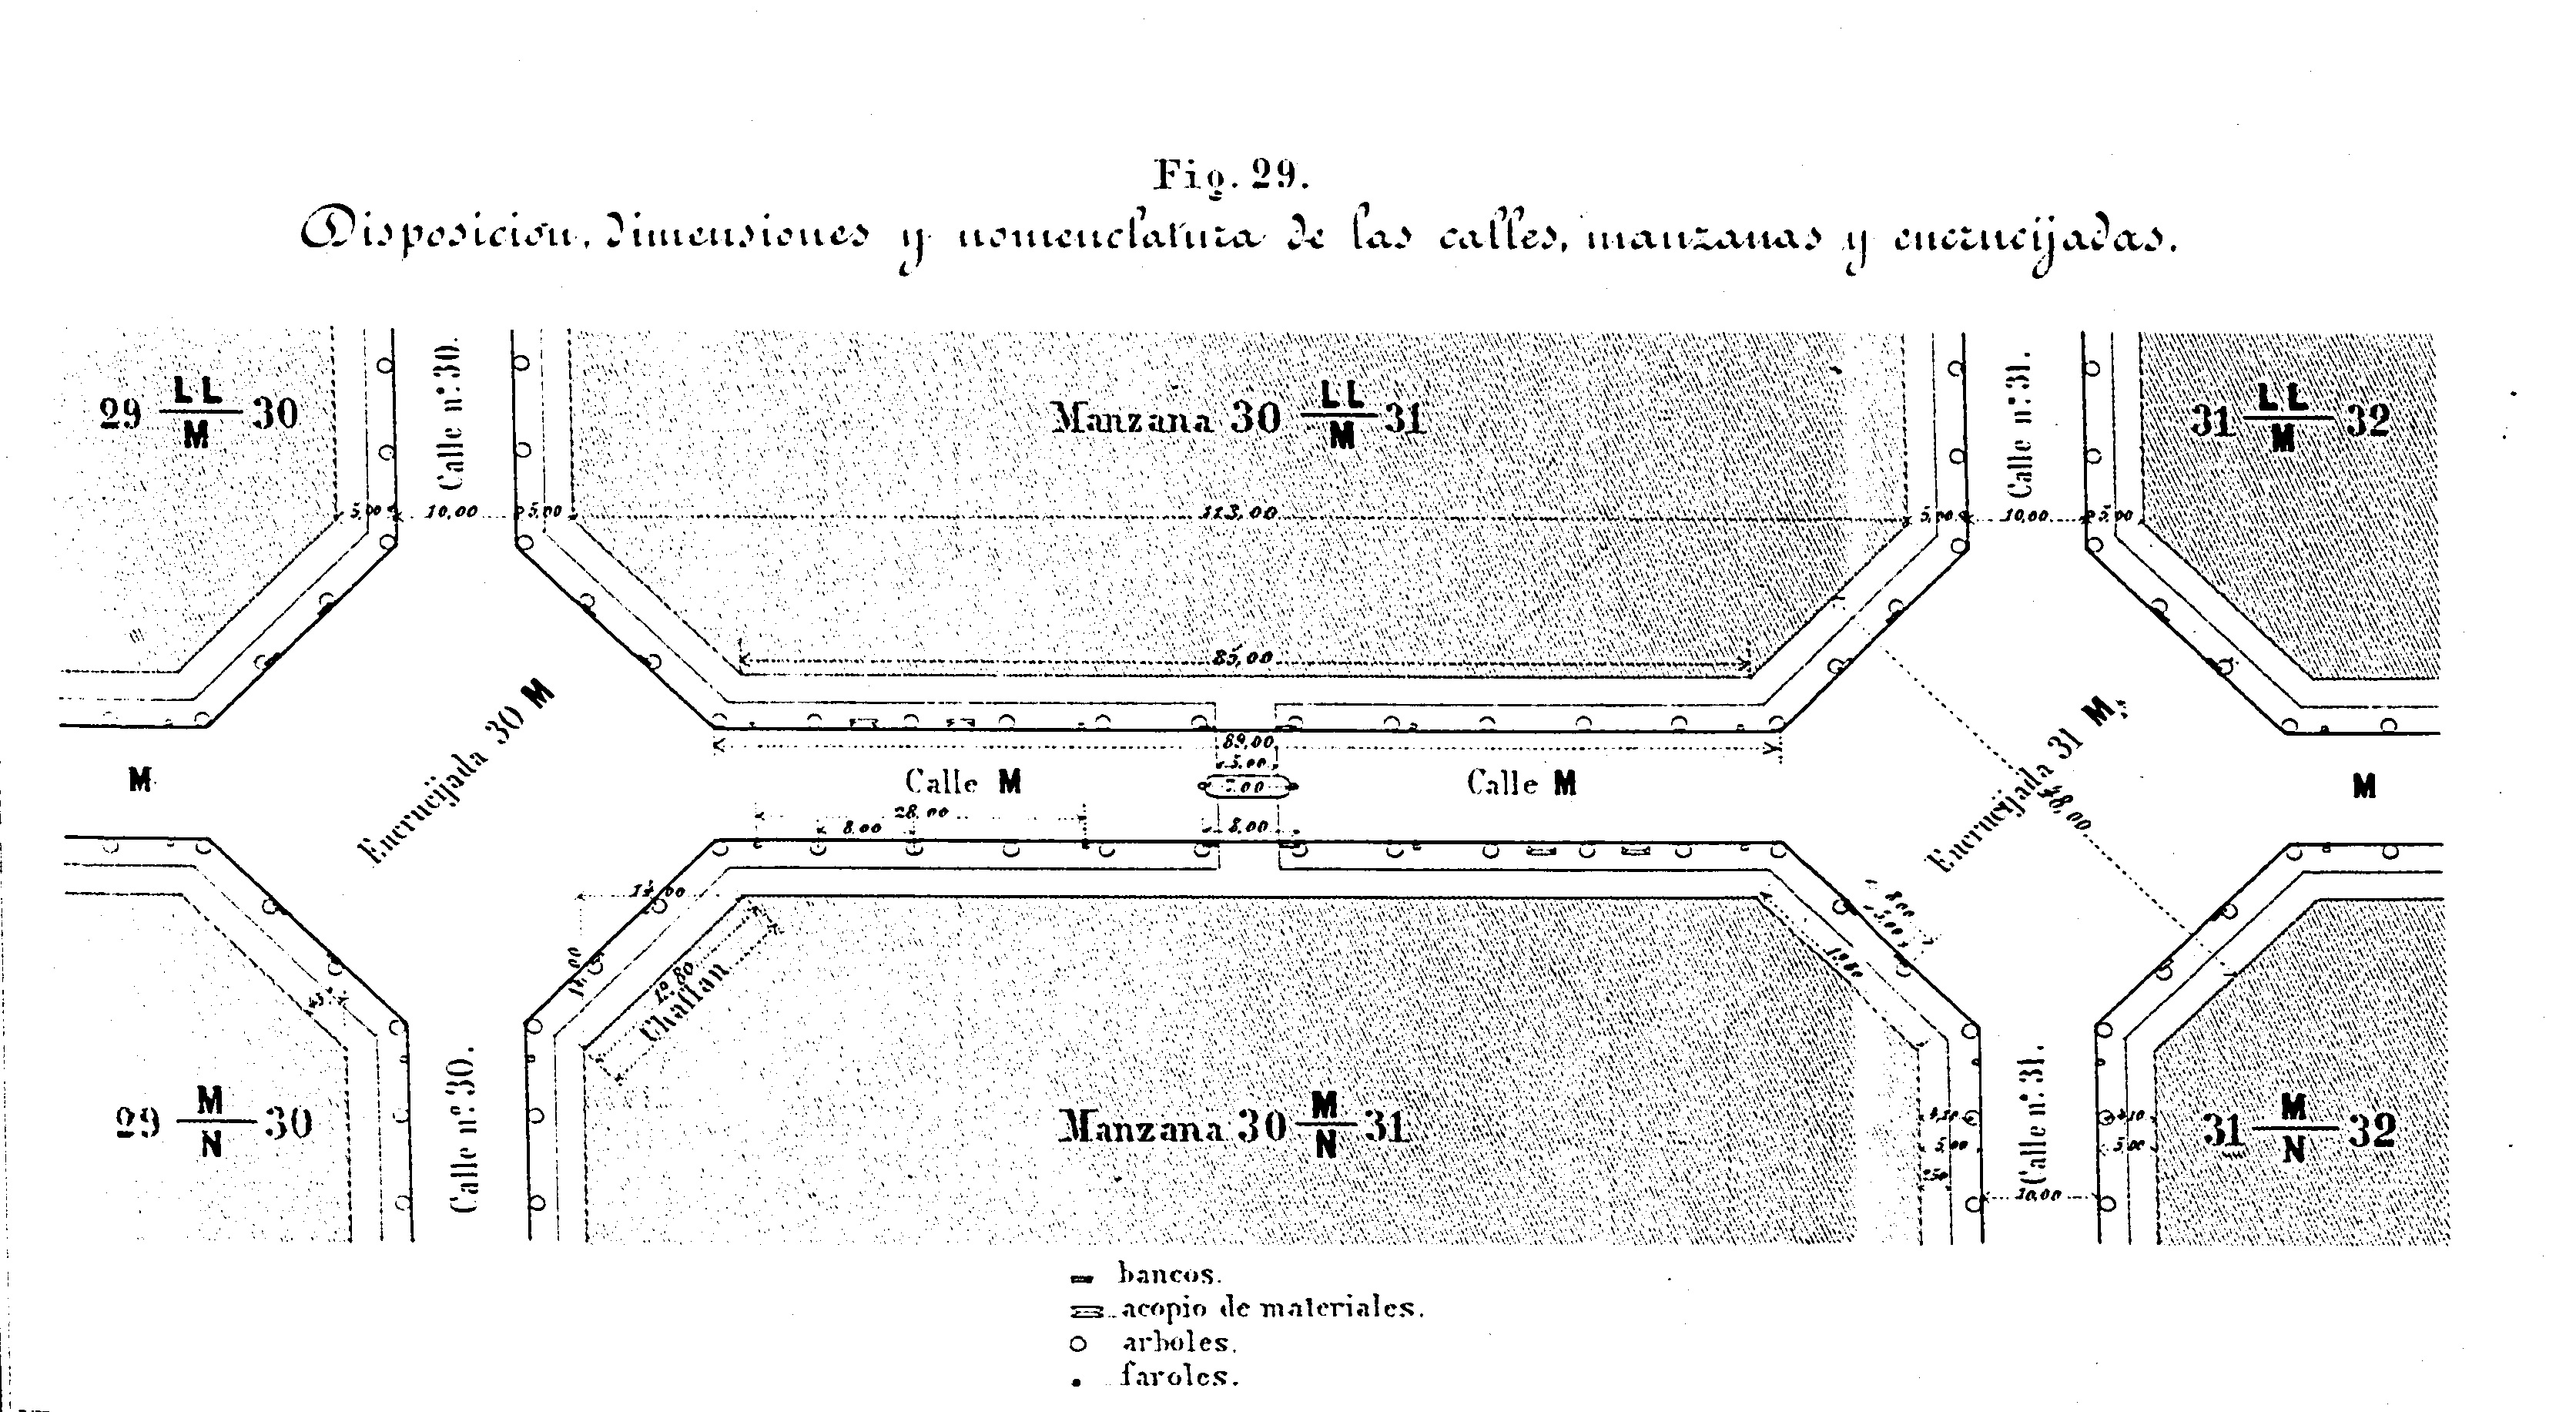 Chaflán Arquitectura Wikipedia La Enciclopedia Libre